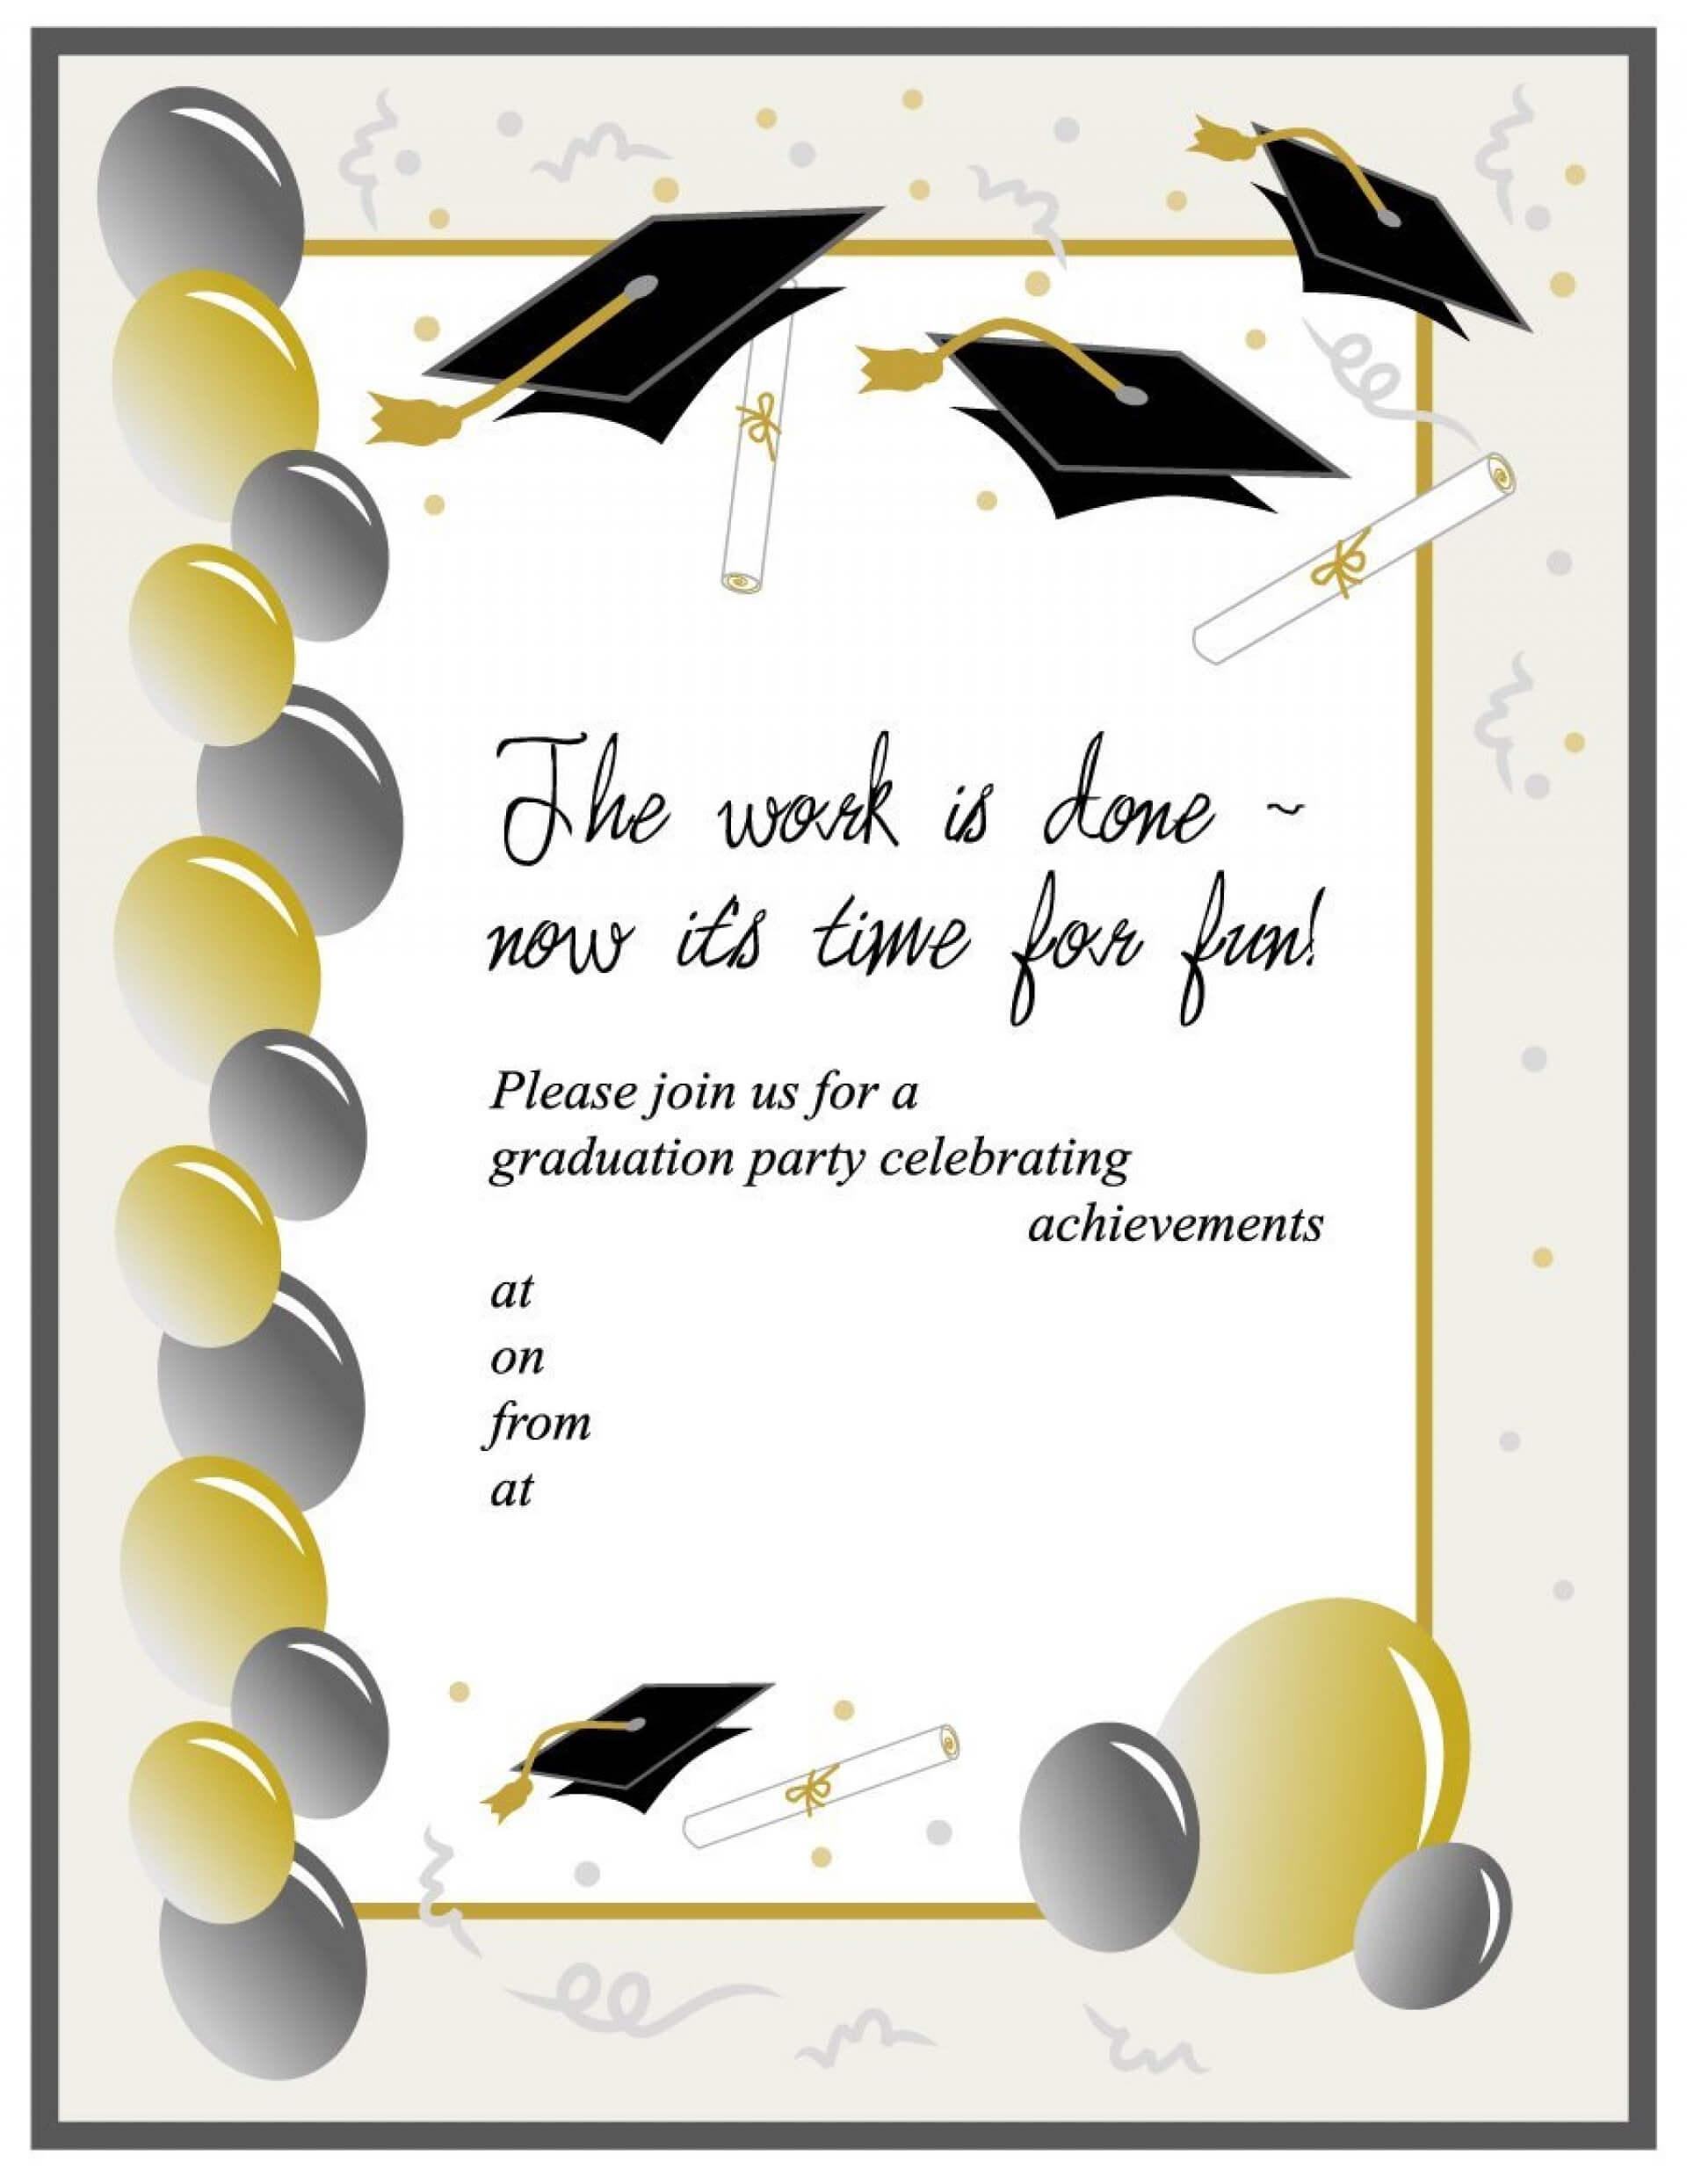 012 Graduation Invitation Templates Template Ideas Party Pertaining To Graduation Party Invitation Templates Free Word